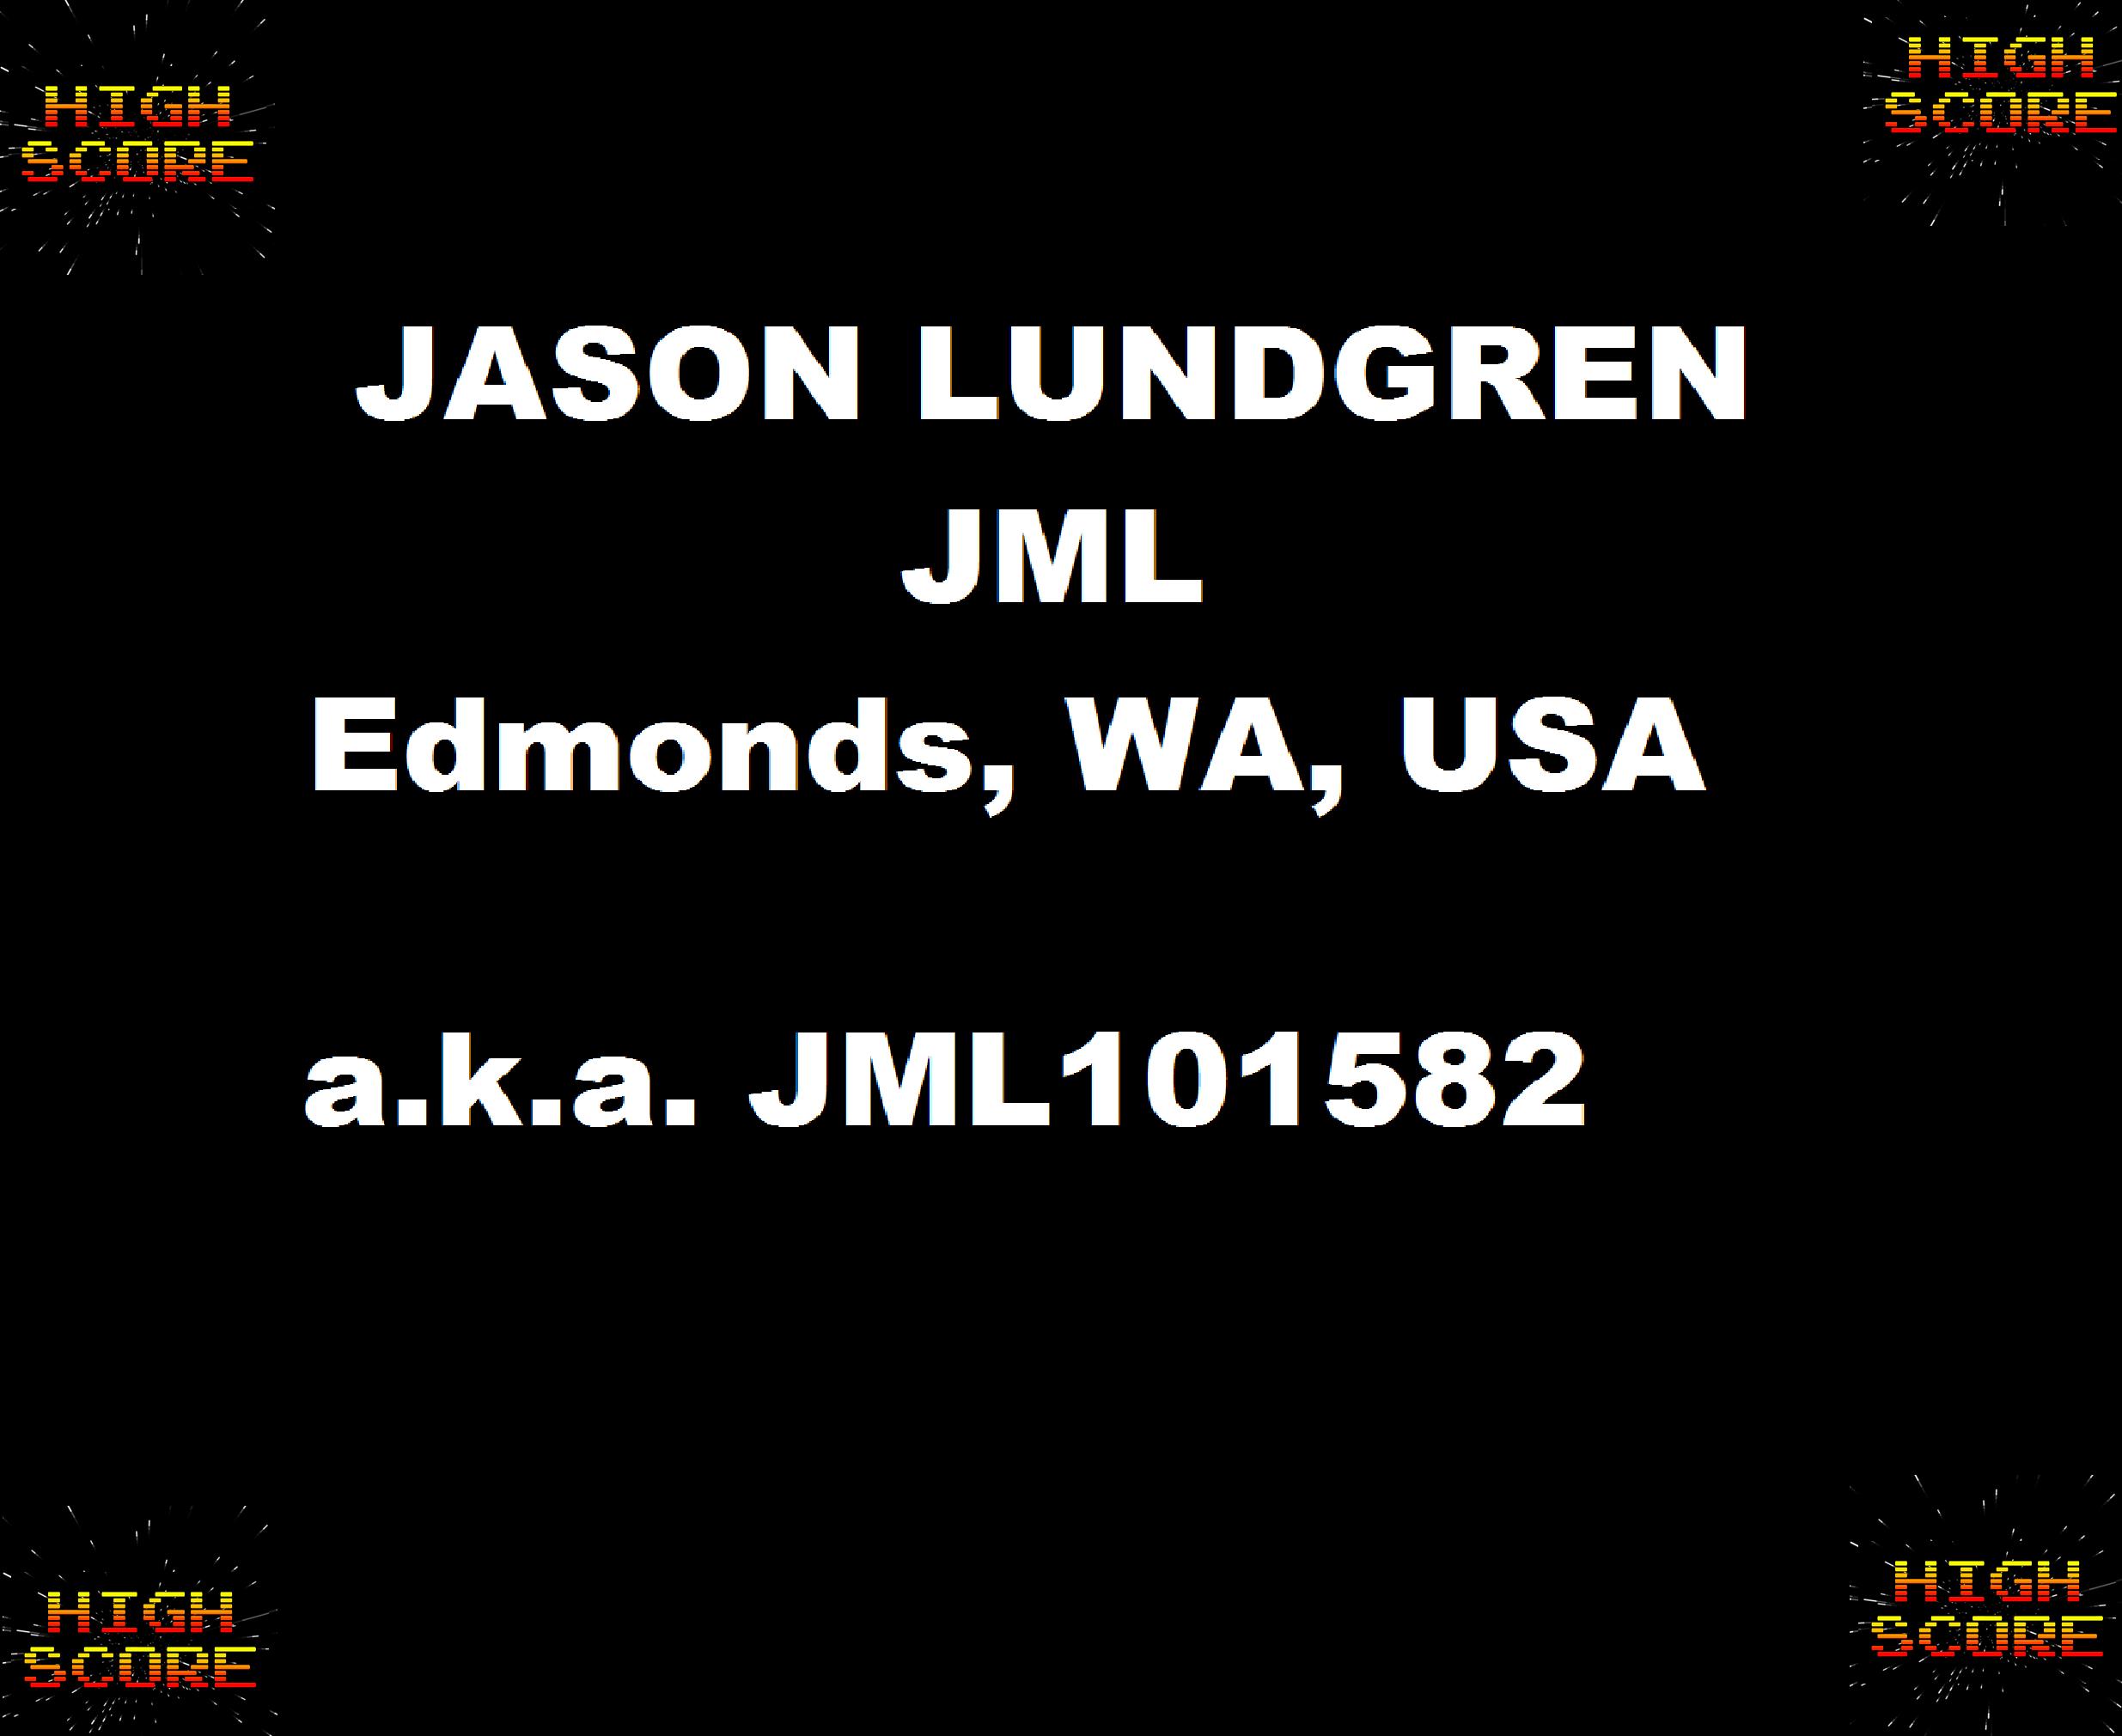 JML101582: Batman (Sega Genesis / MegaDrive Emulated) 25,300 points on 2019-06-21 20:28:24